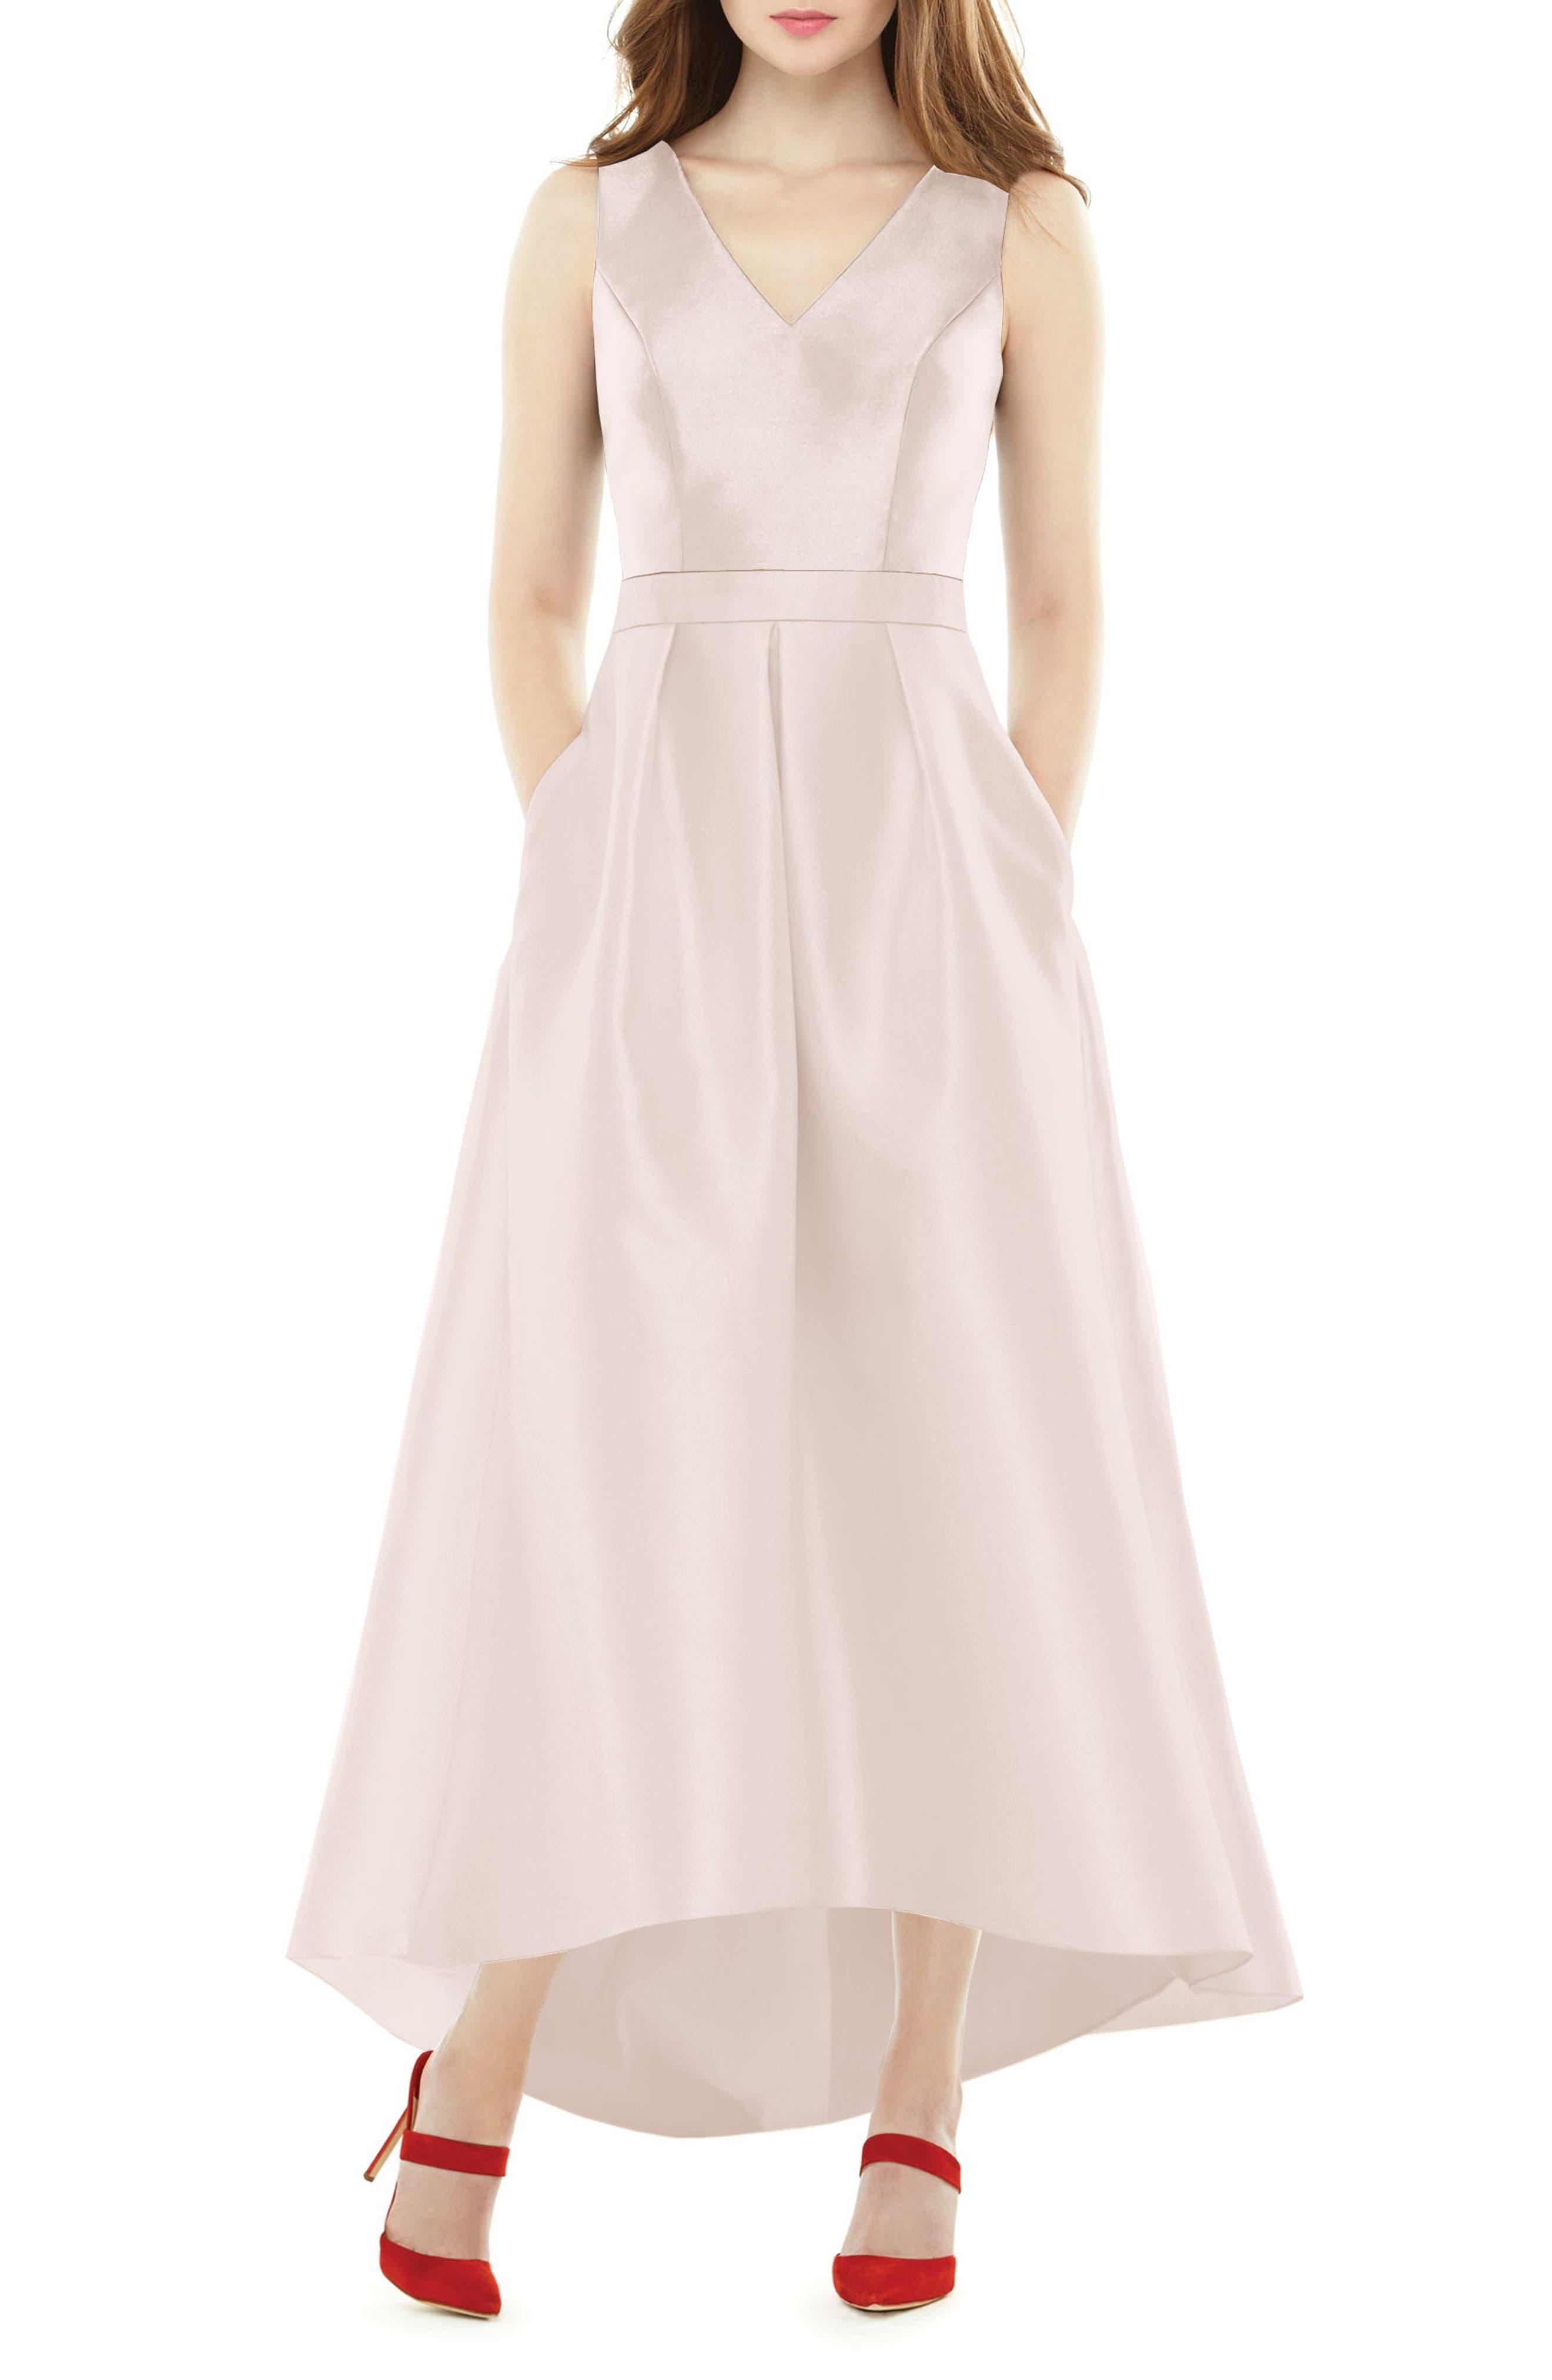 6d96677c844df7 Women s High Low Dresses